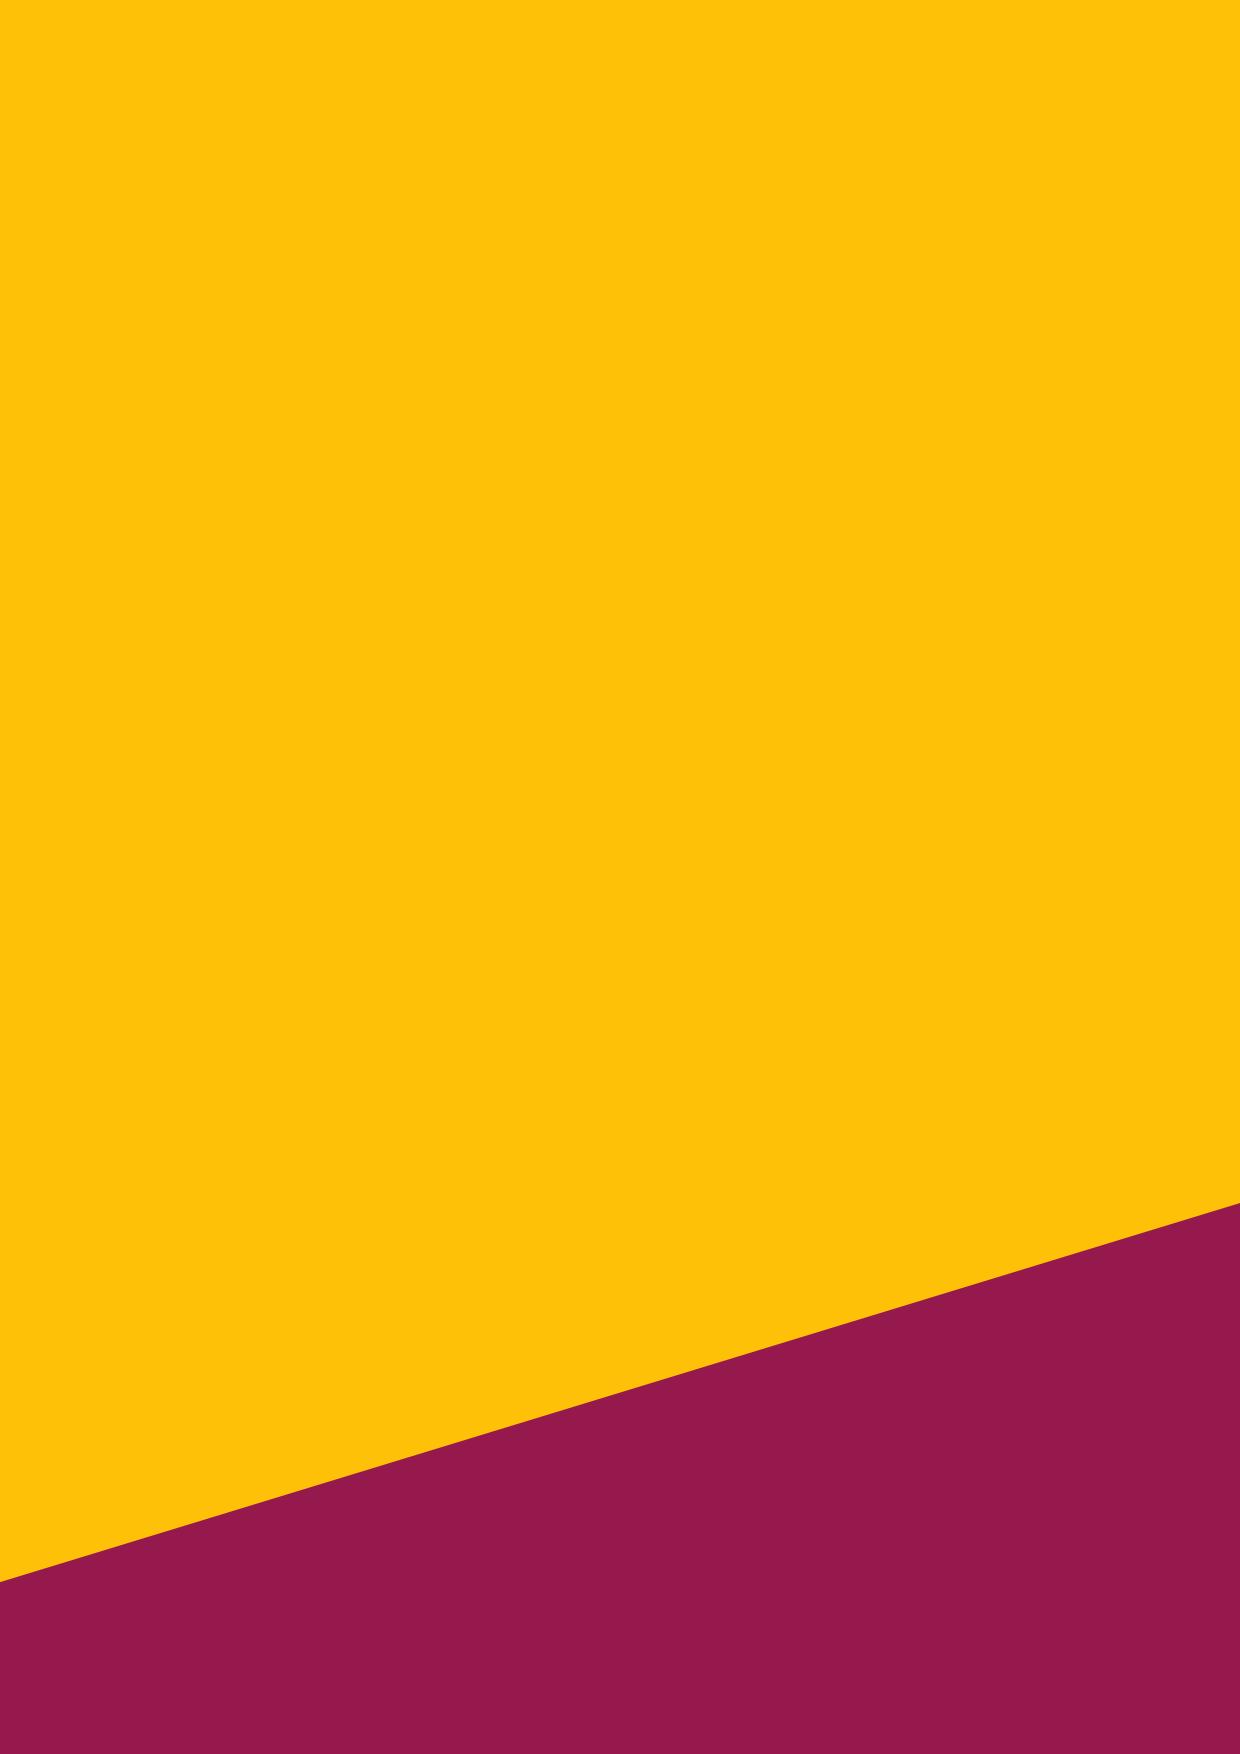 Yellow,                Red,                 Free Image